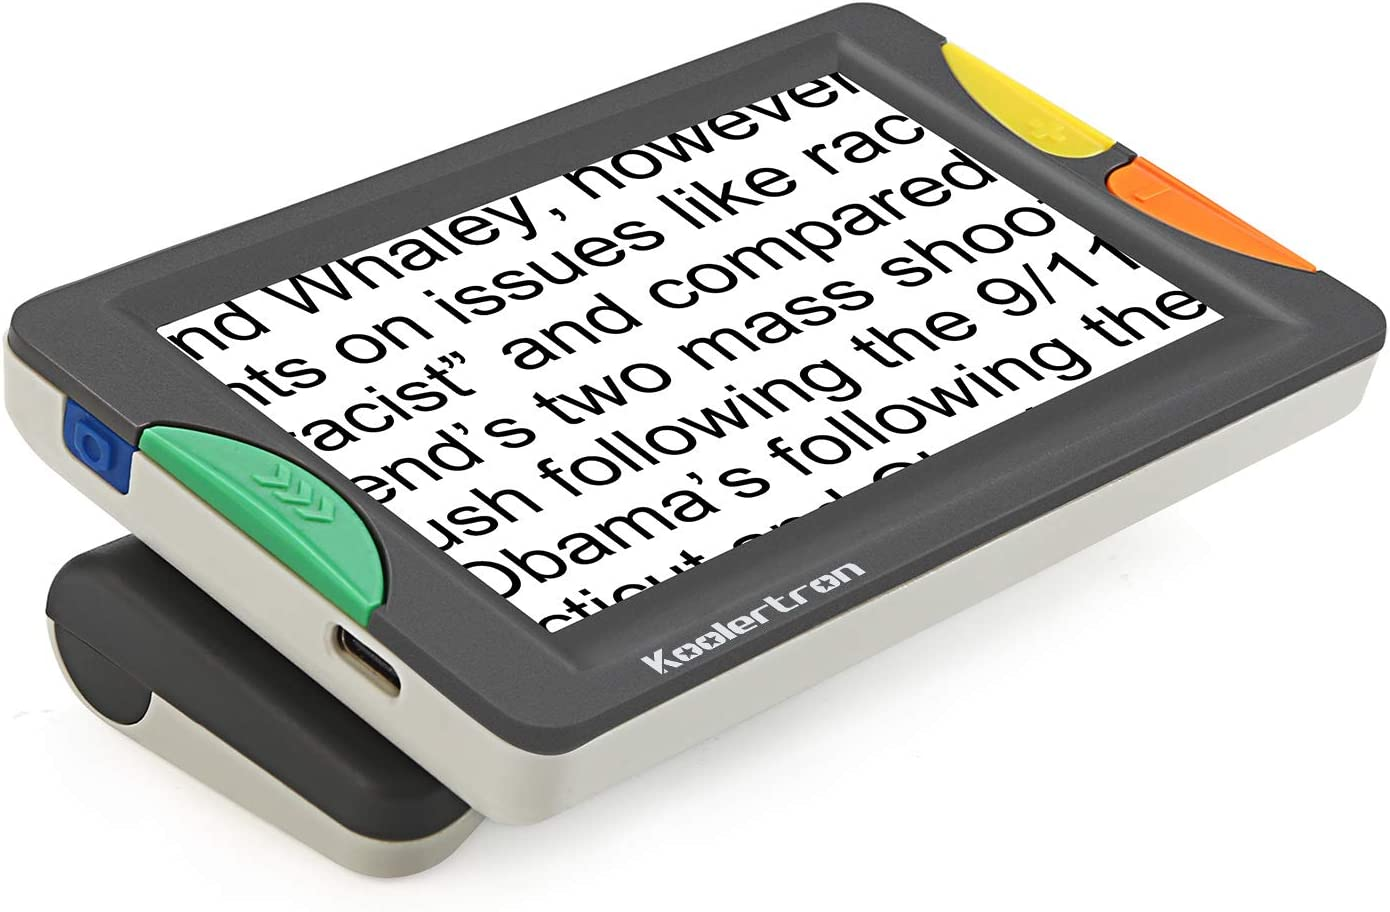 Digital Video Magnifier 4 3 Zoll Handportable Mobile Elektronik